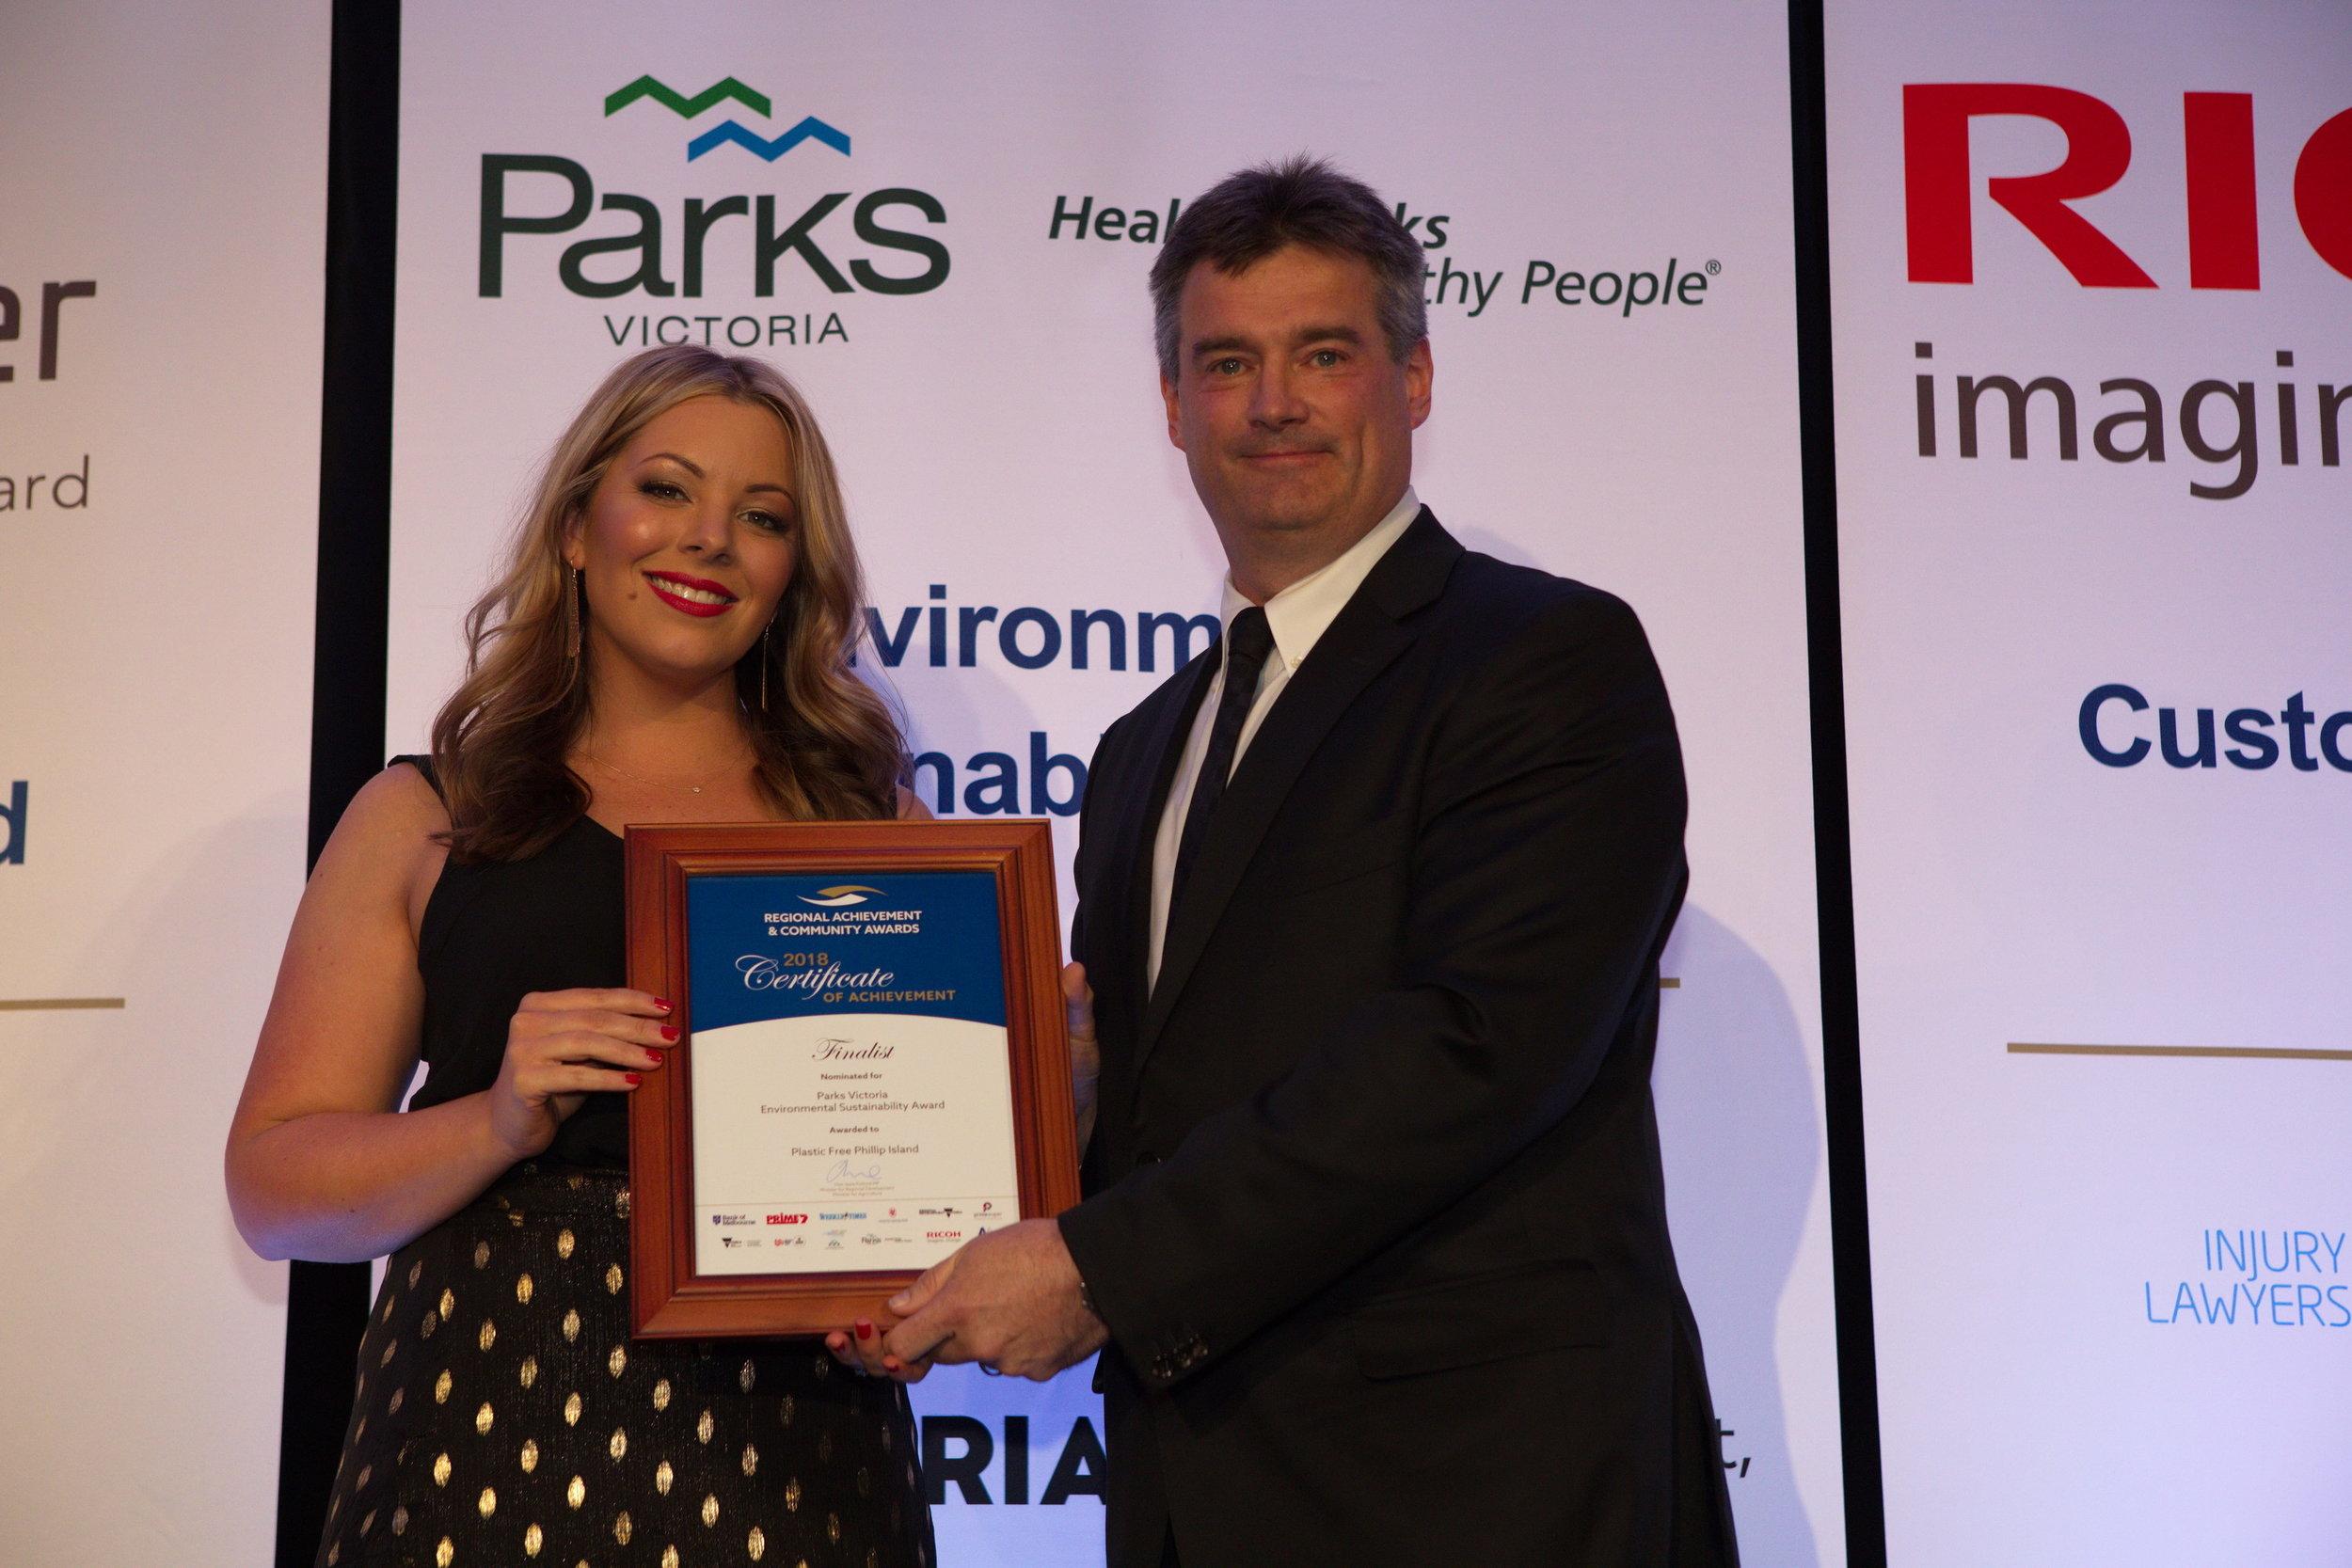 Founder Lauren Barker with Parks Victoria CEO Matthew Jackson